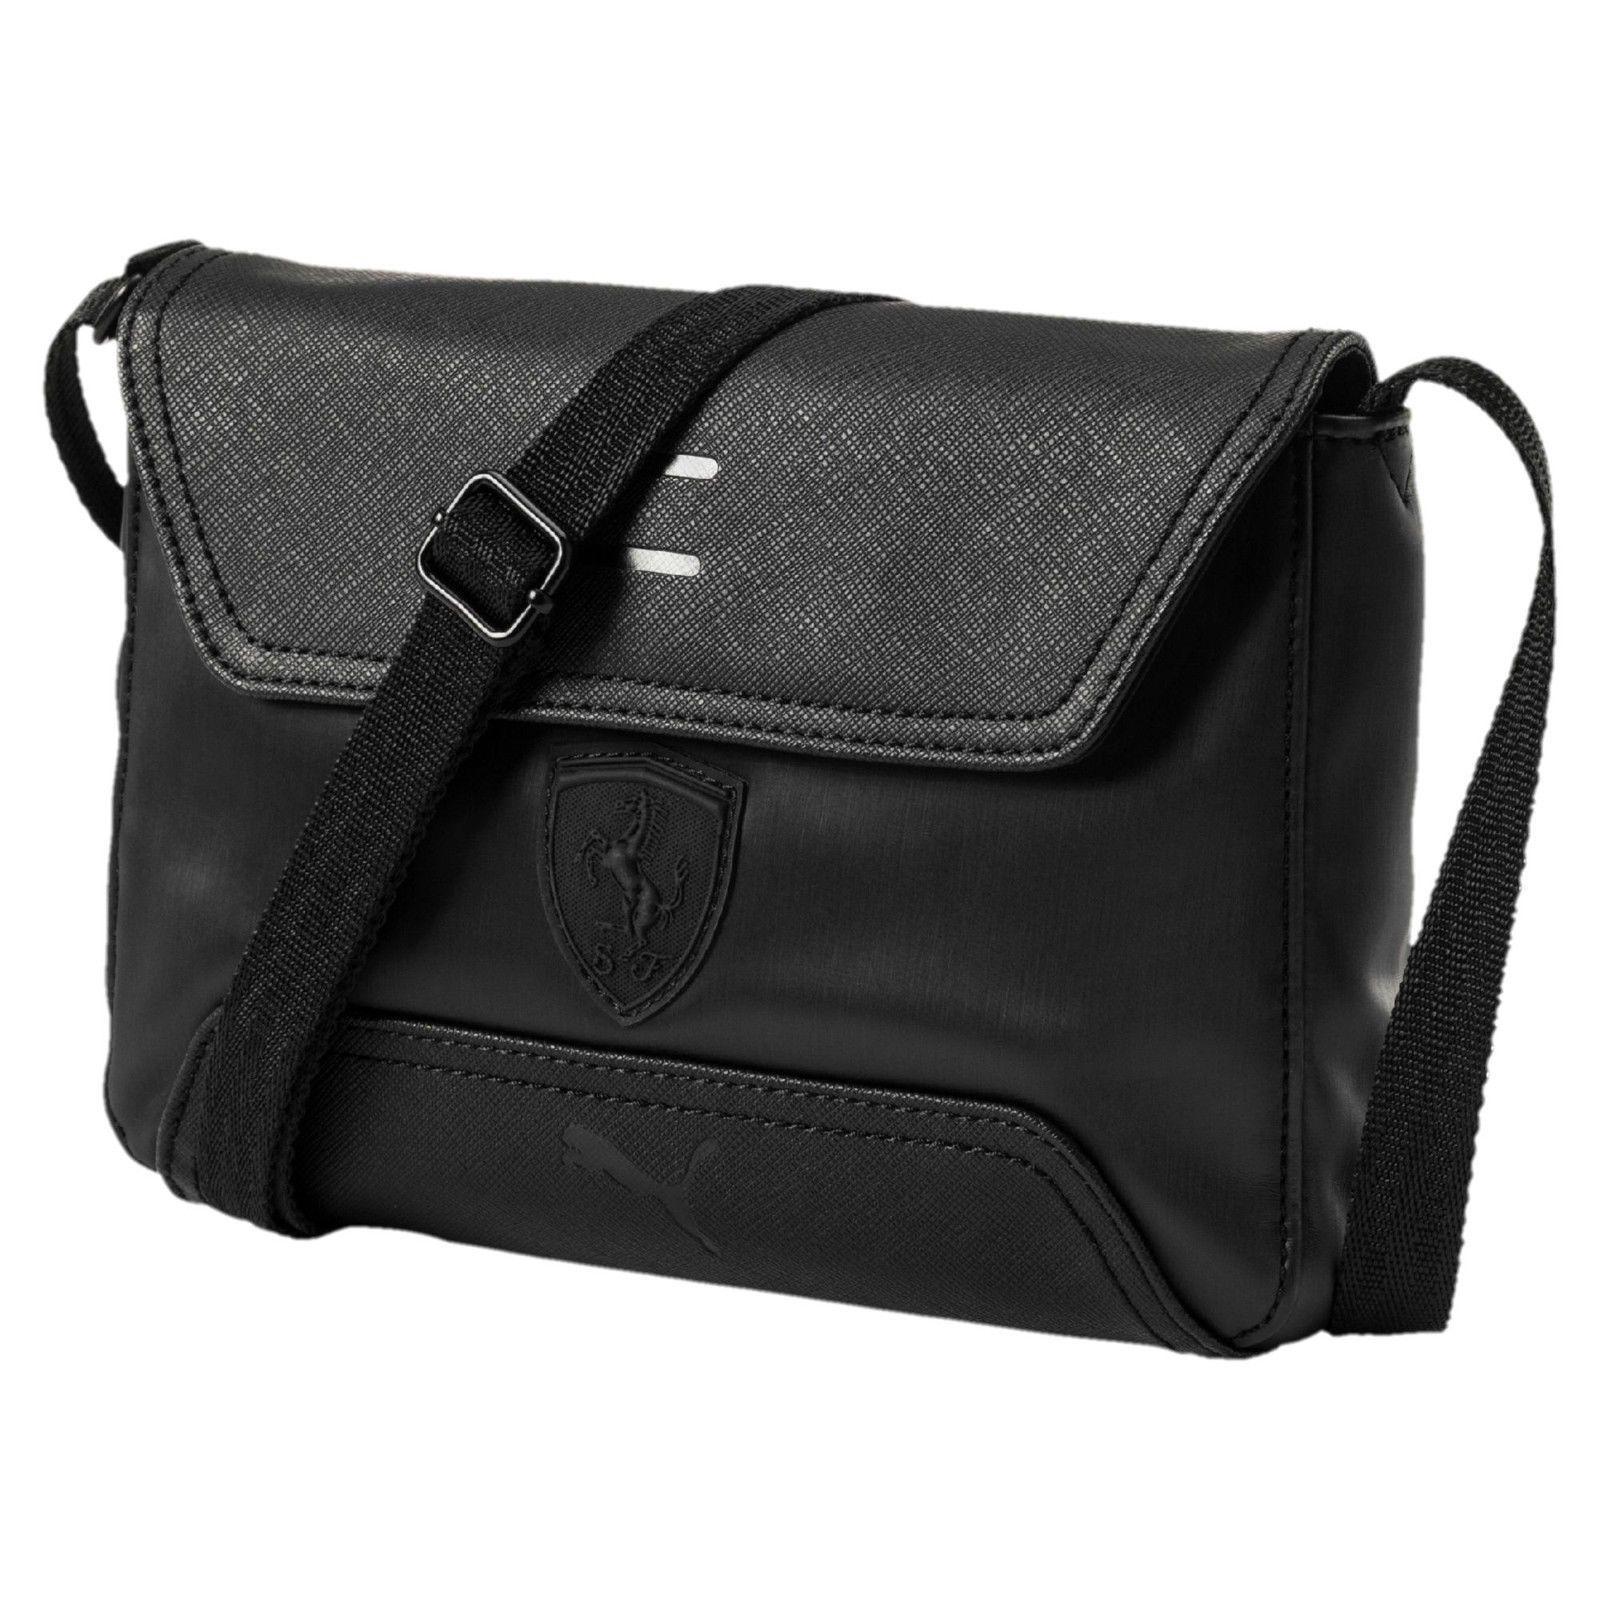 Puma Ferrari Handbags Bag Bags Handbag Ideas Expensive Fashion Black